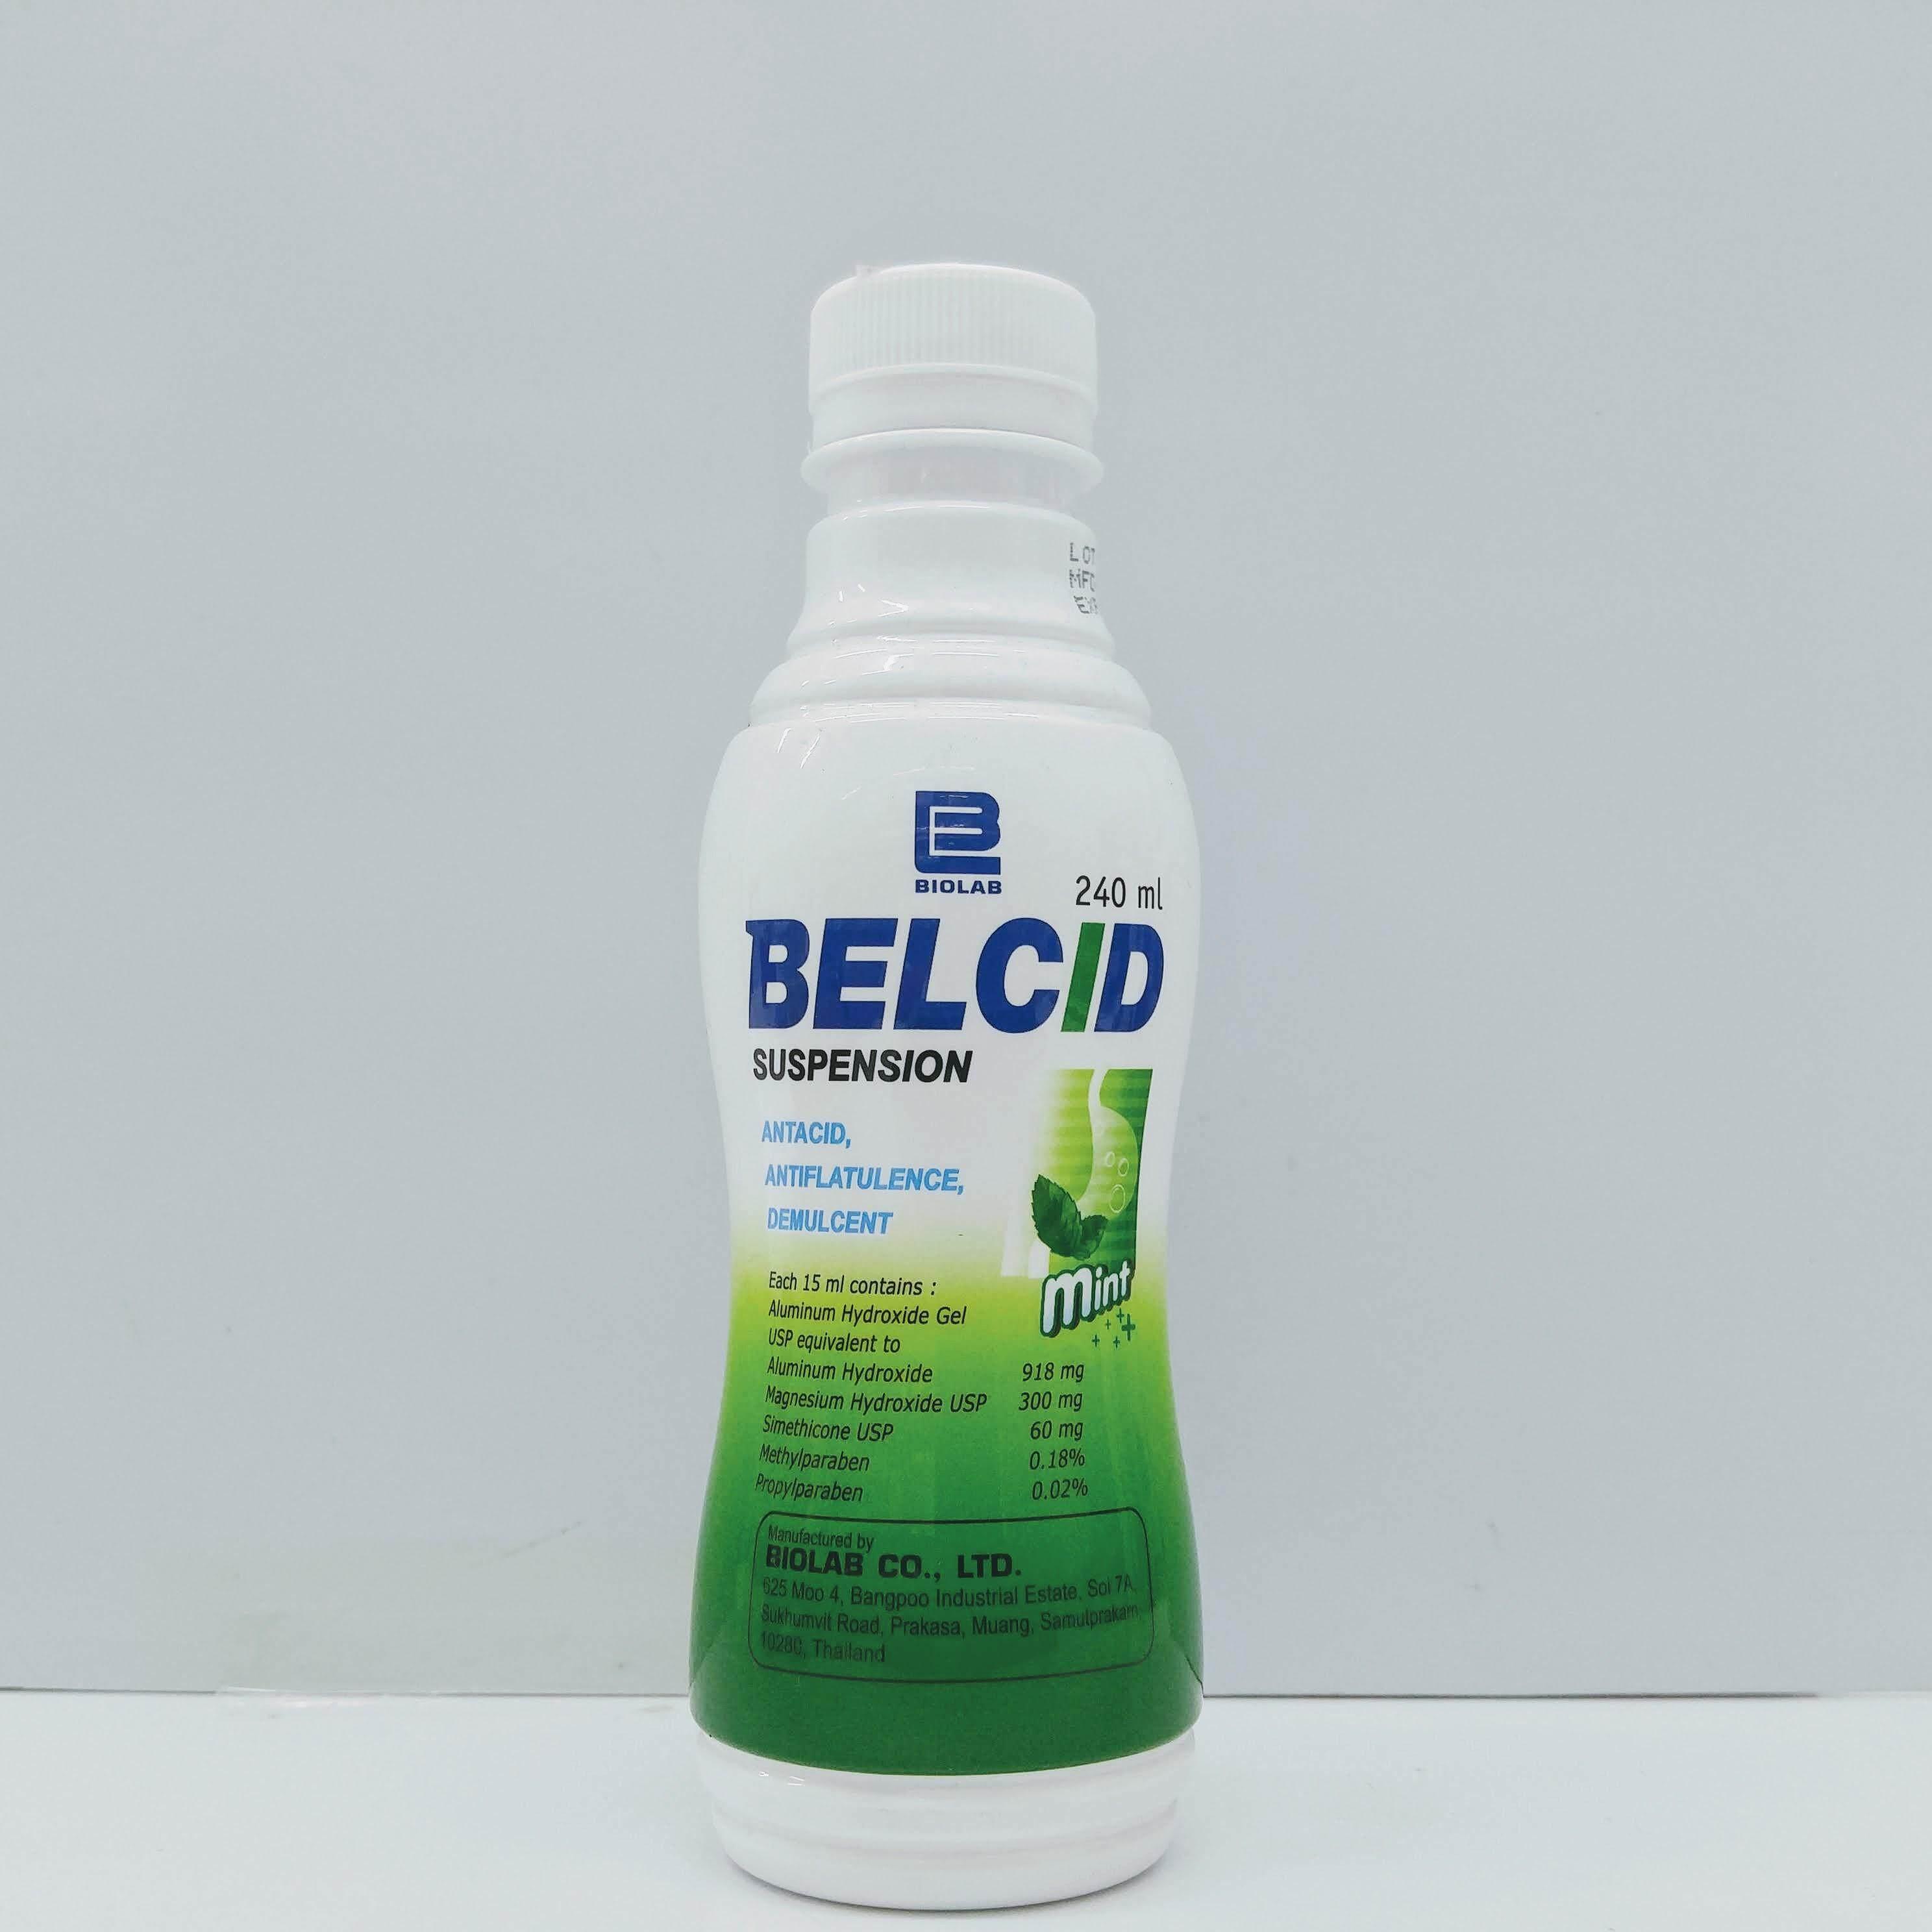 Belcid Antacid Mint Suspension 240ml exp21.05